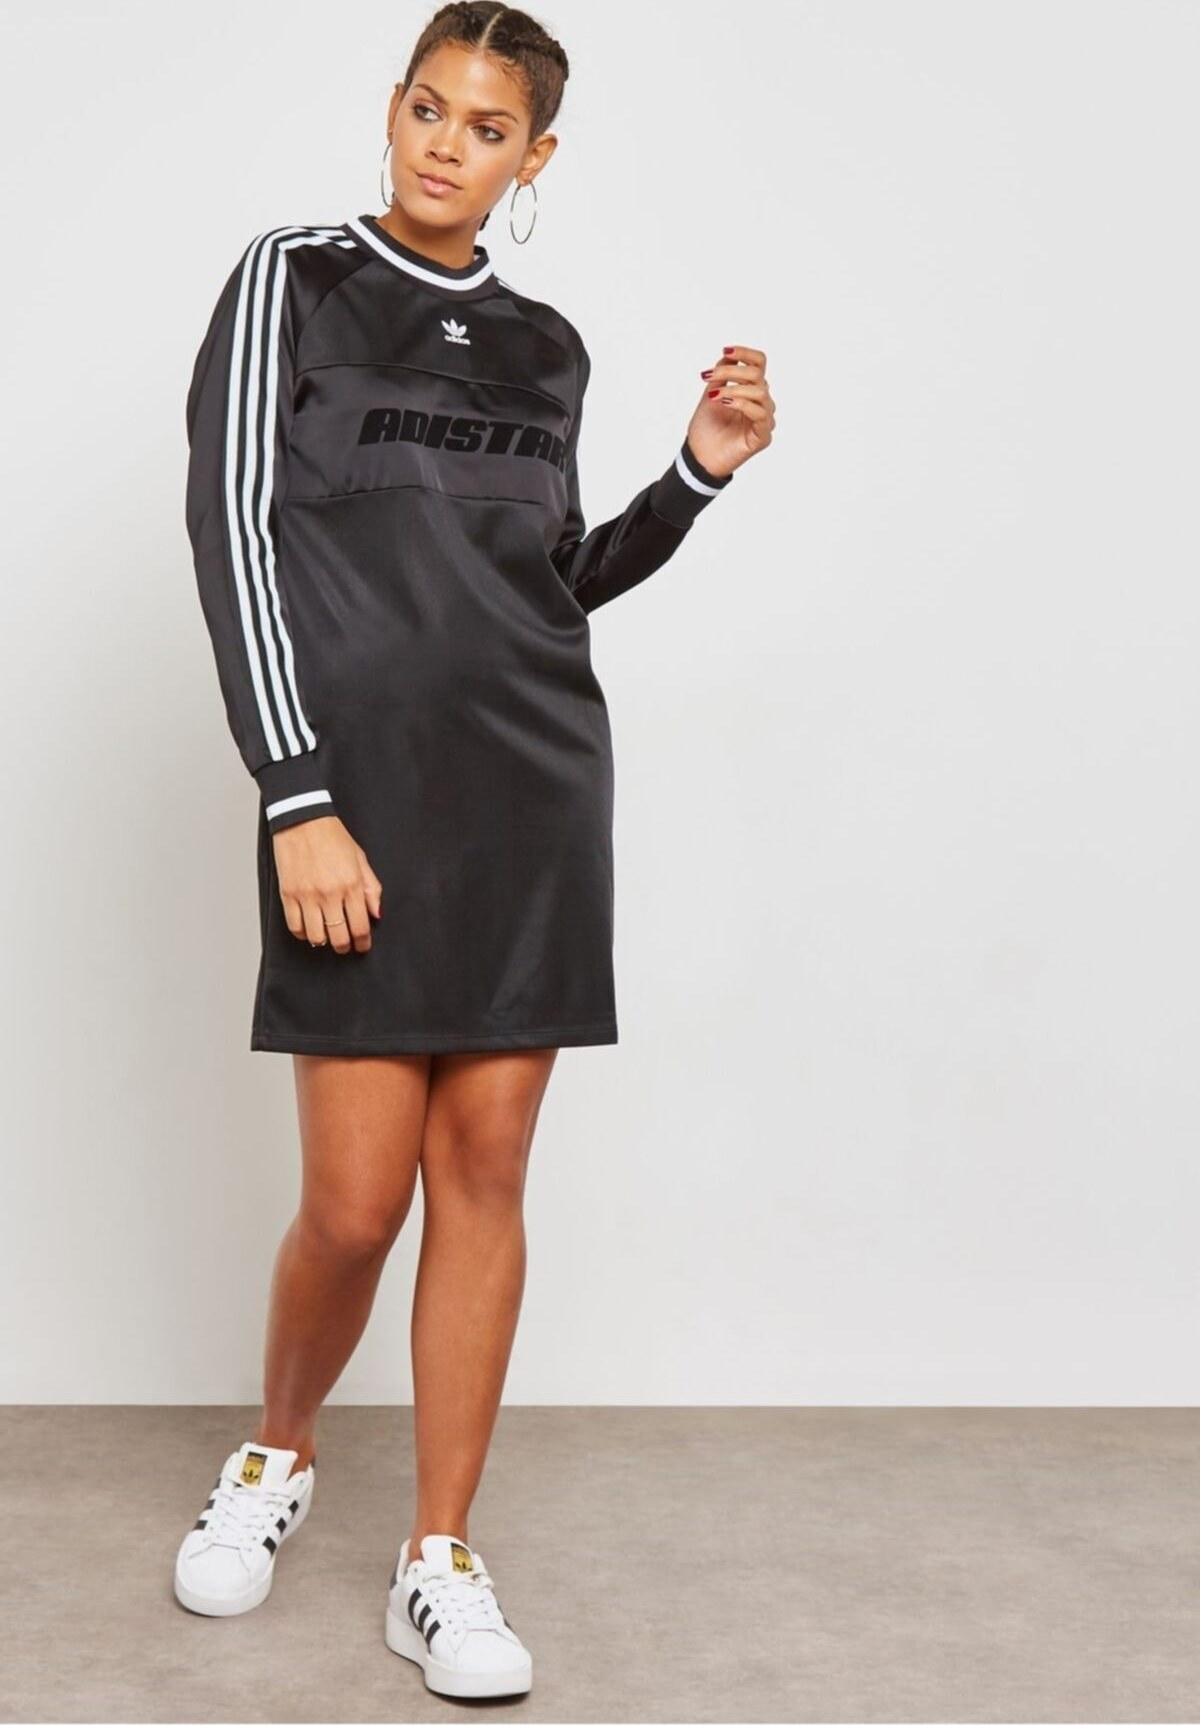 تصویر پیراهن تونیک زنانه مشکی برند adidas کد 1616971322